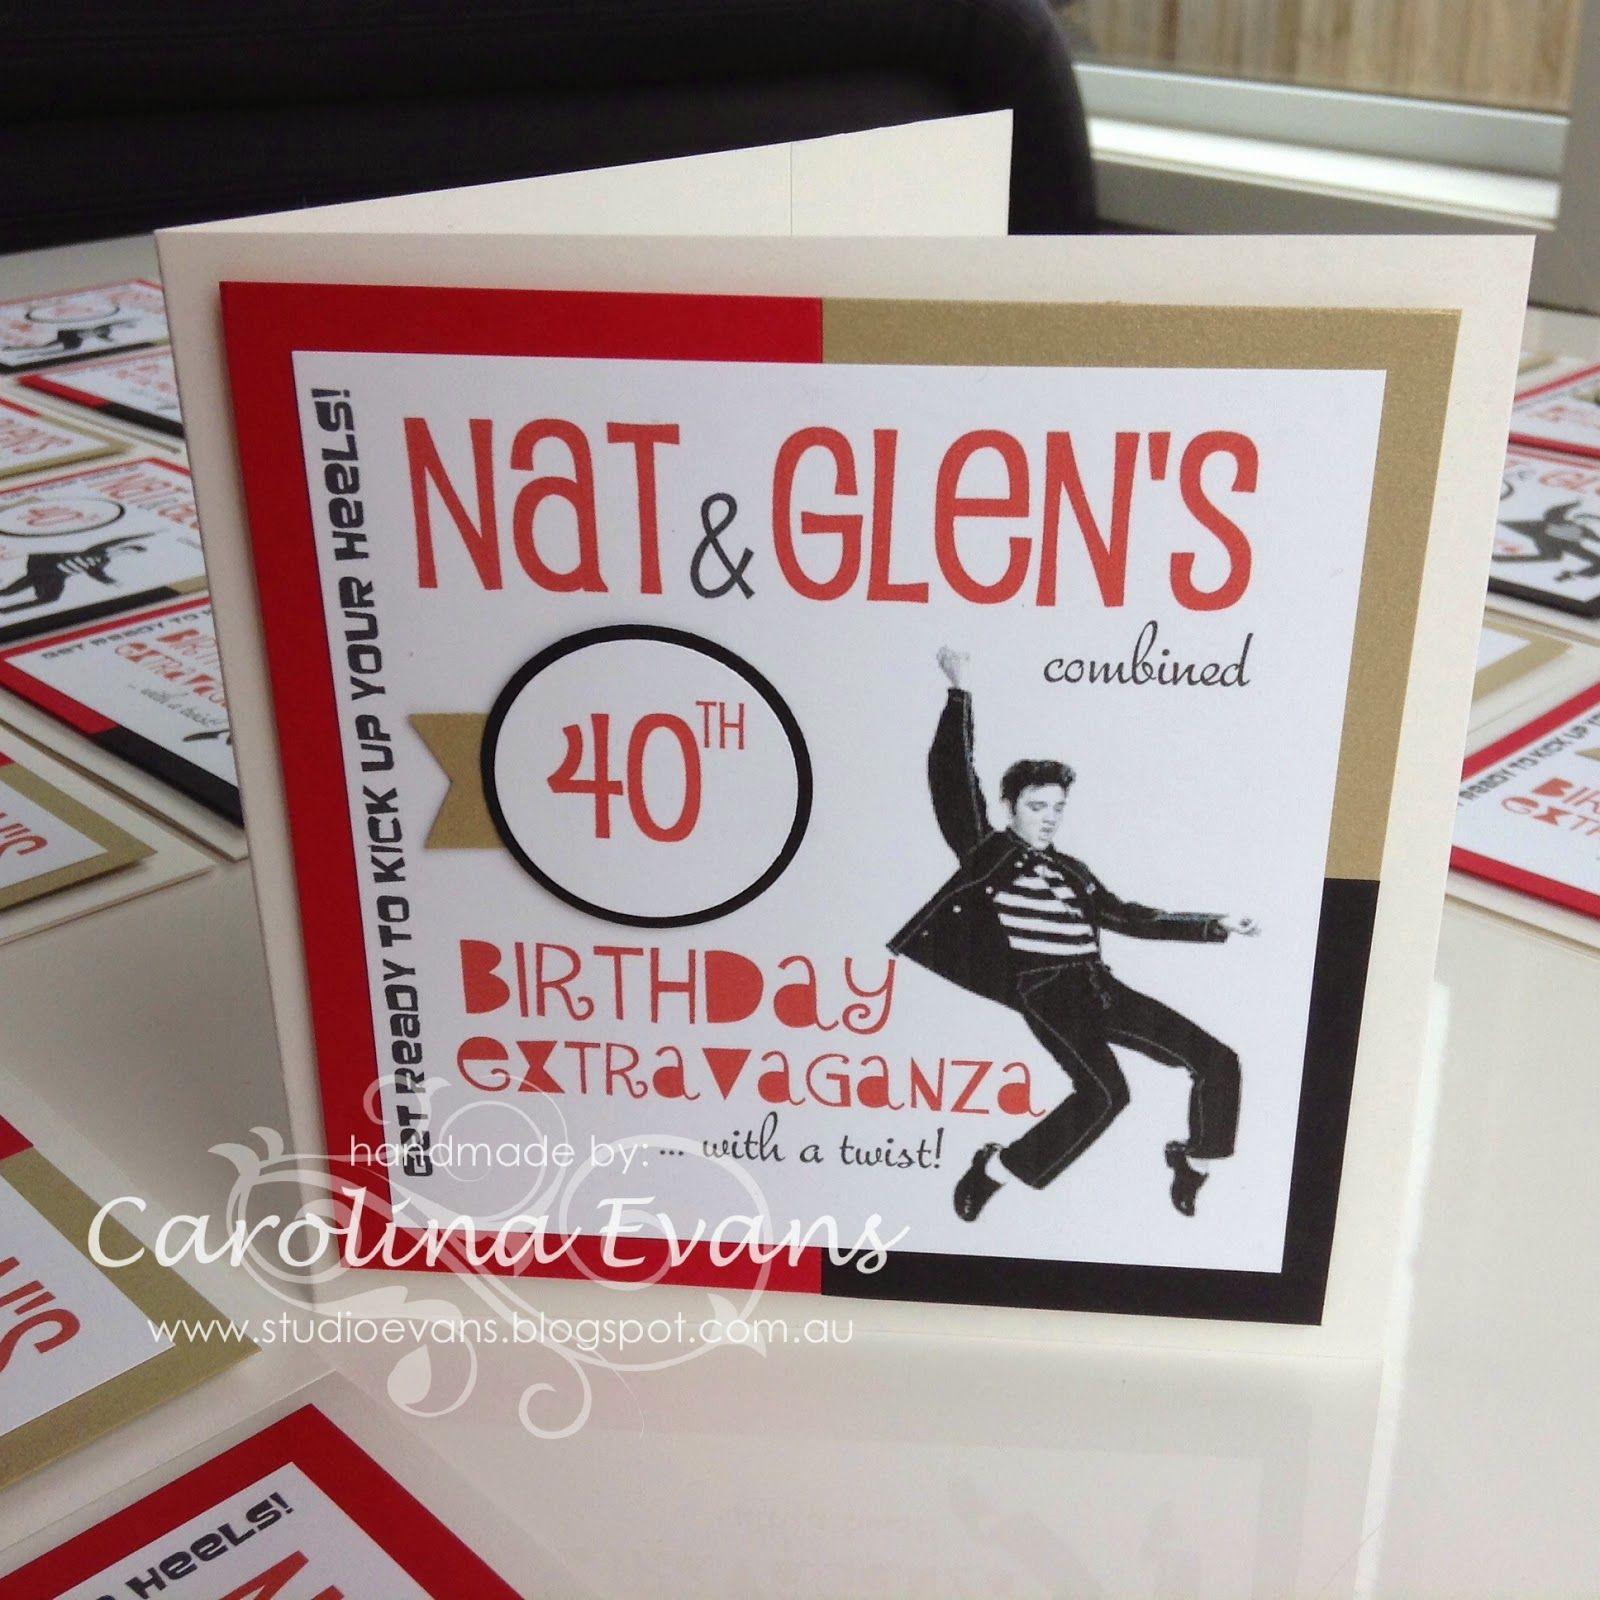 Elvis 40th Birthday Party Invitations | Carolina Evans - My Stampin ...